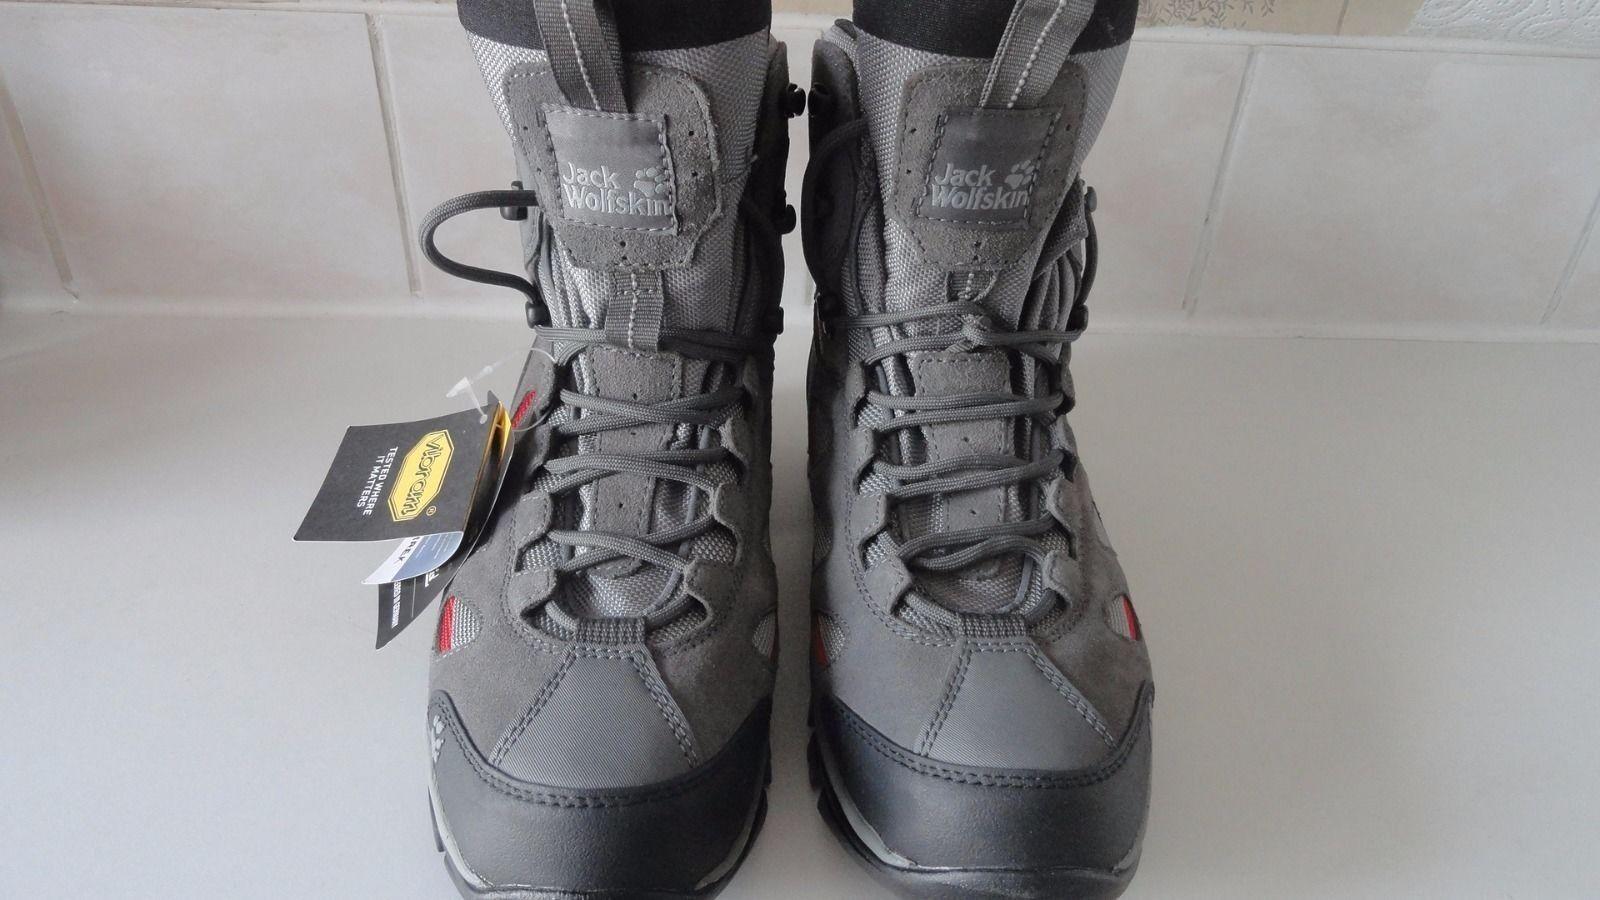 Jack Wolfskin Snow Pass womens walking boots, size 6.5